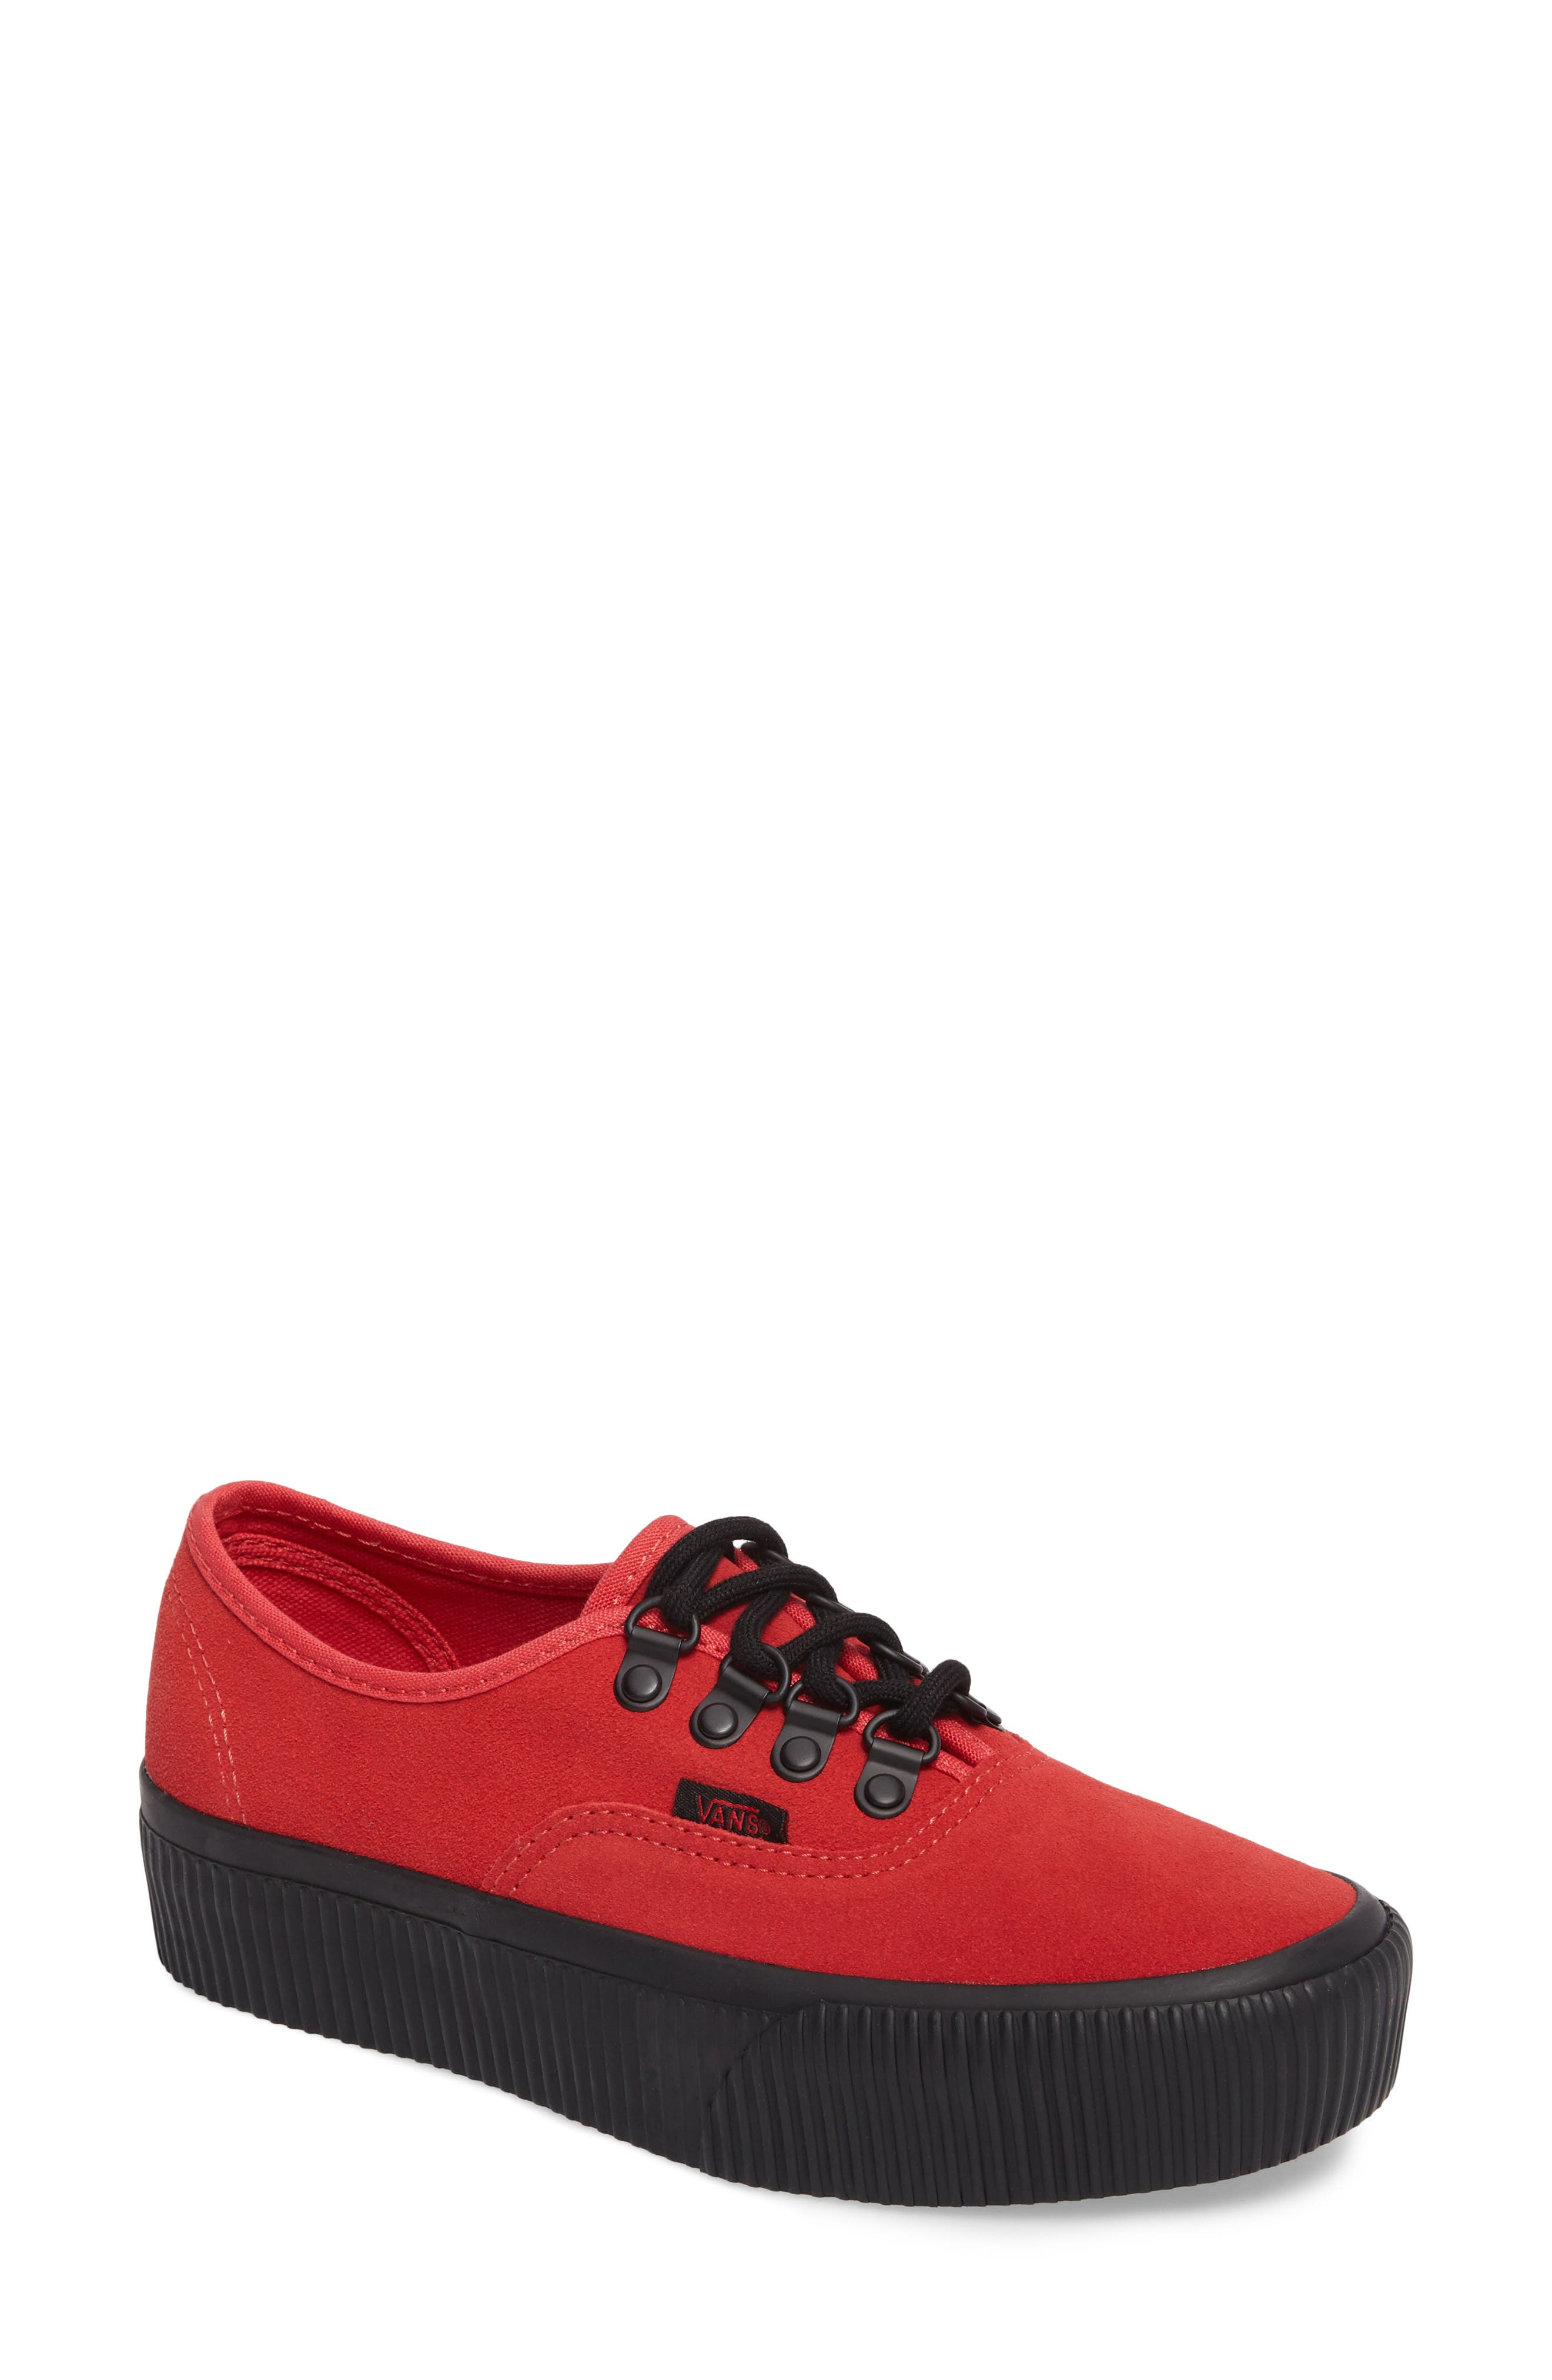 Alternate Image 1 Selected - Vans Authentic 2.0 Platform Sneaker (Women)